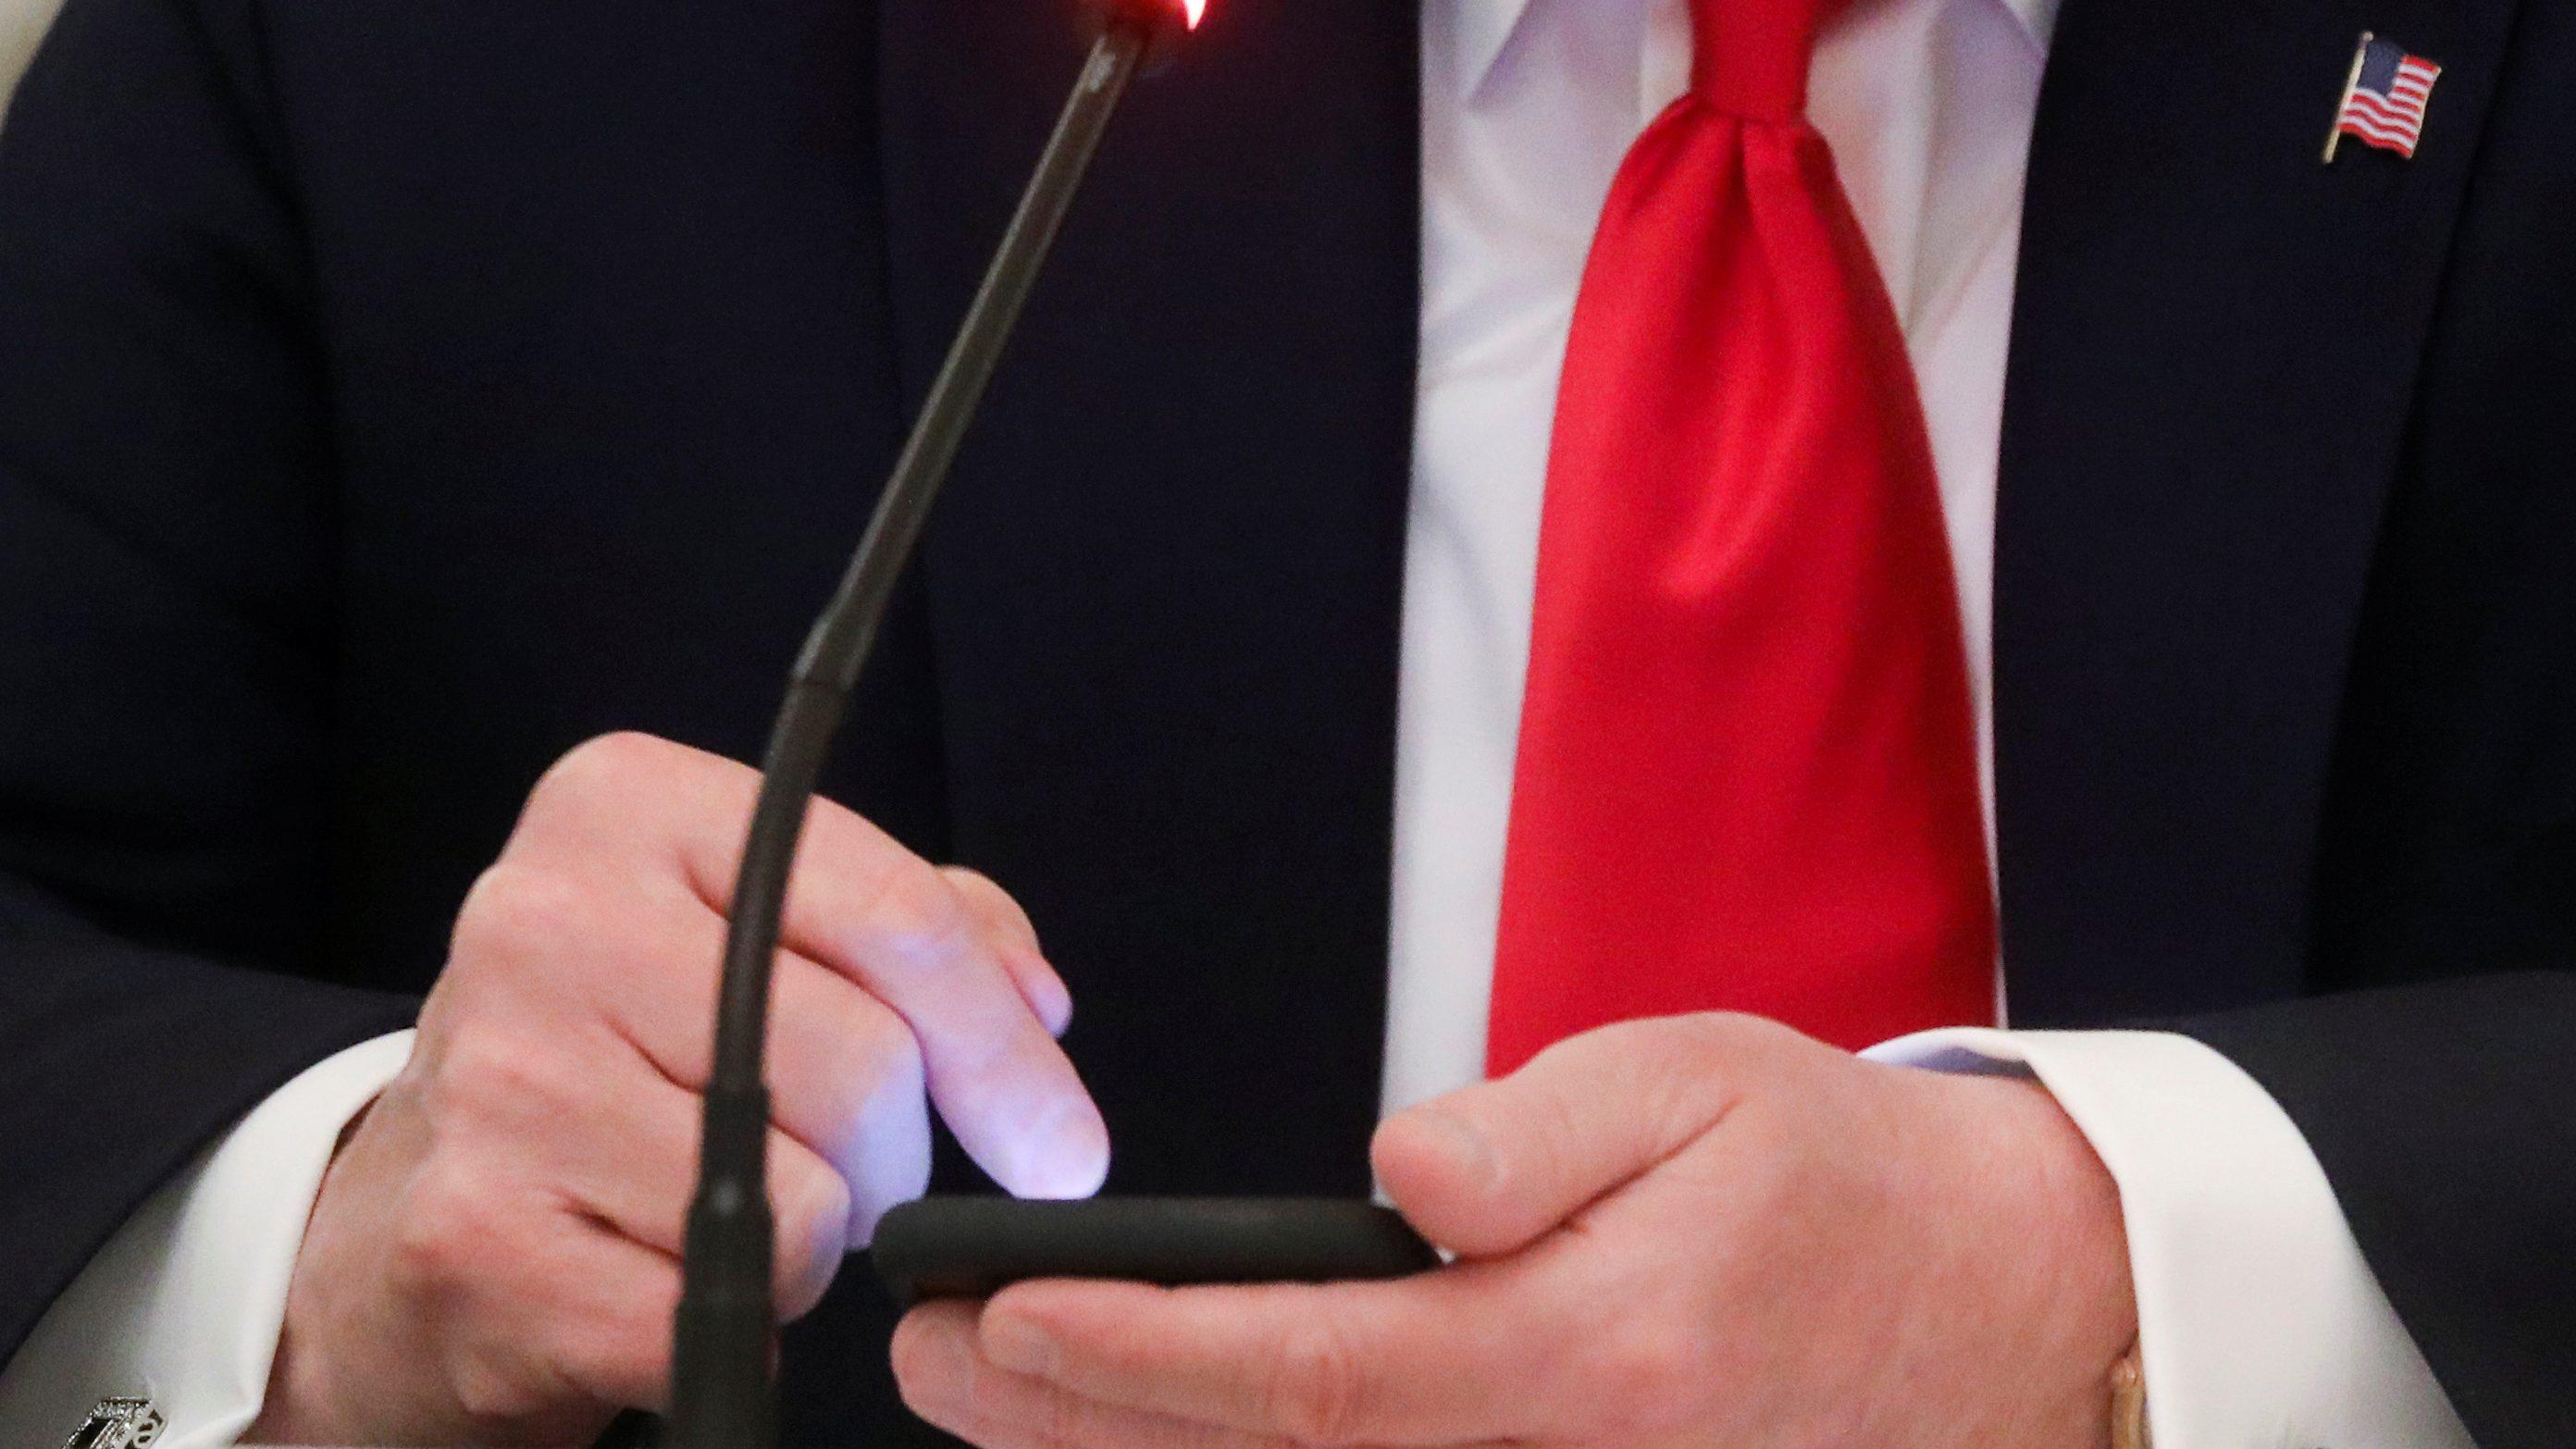 A close-up photograph of Donald Trump using a cellphone.